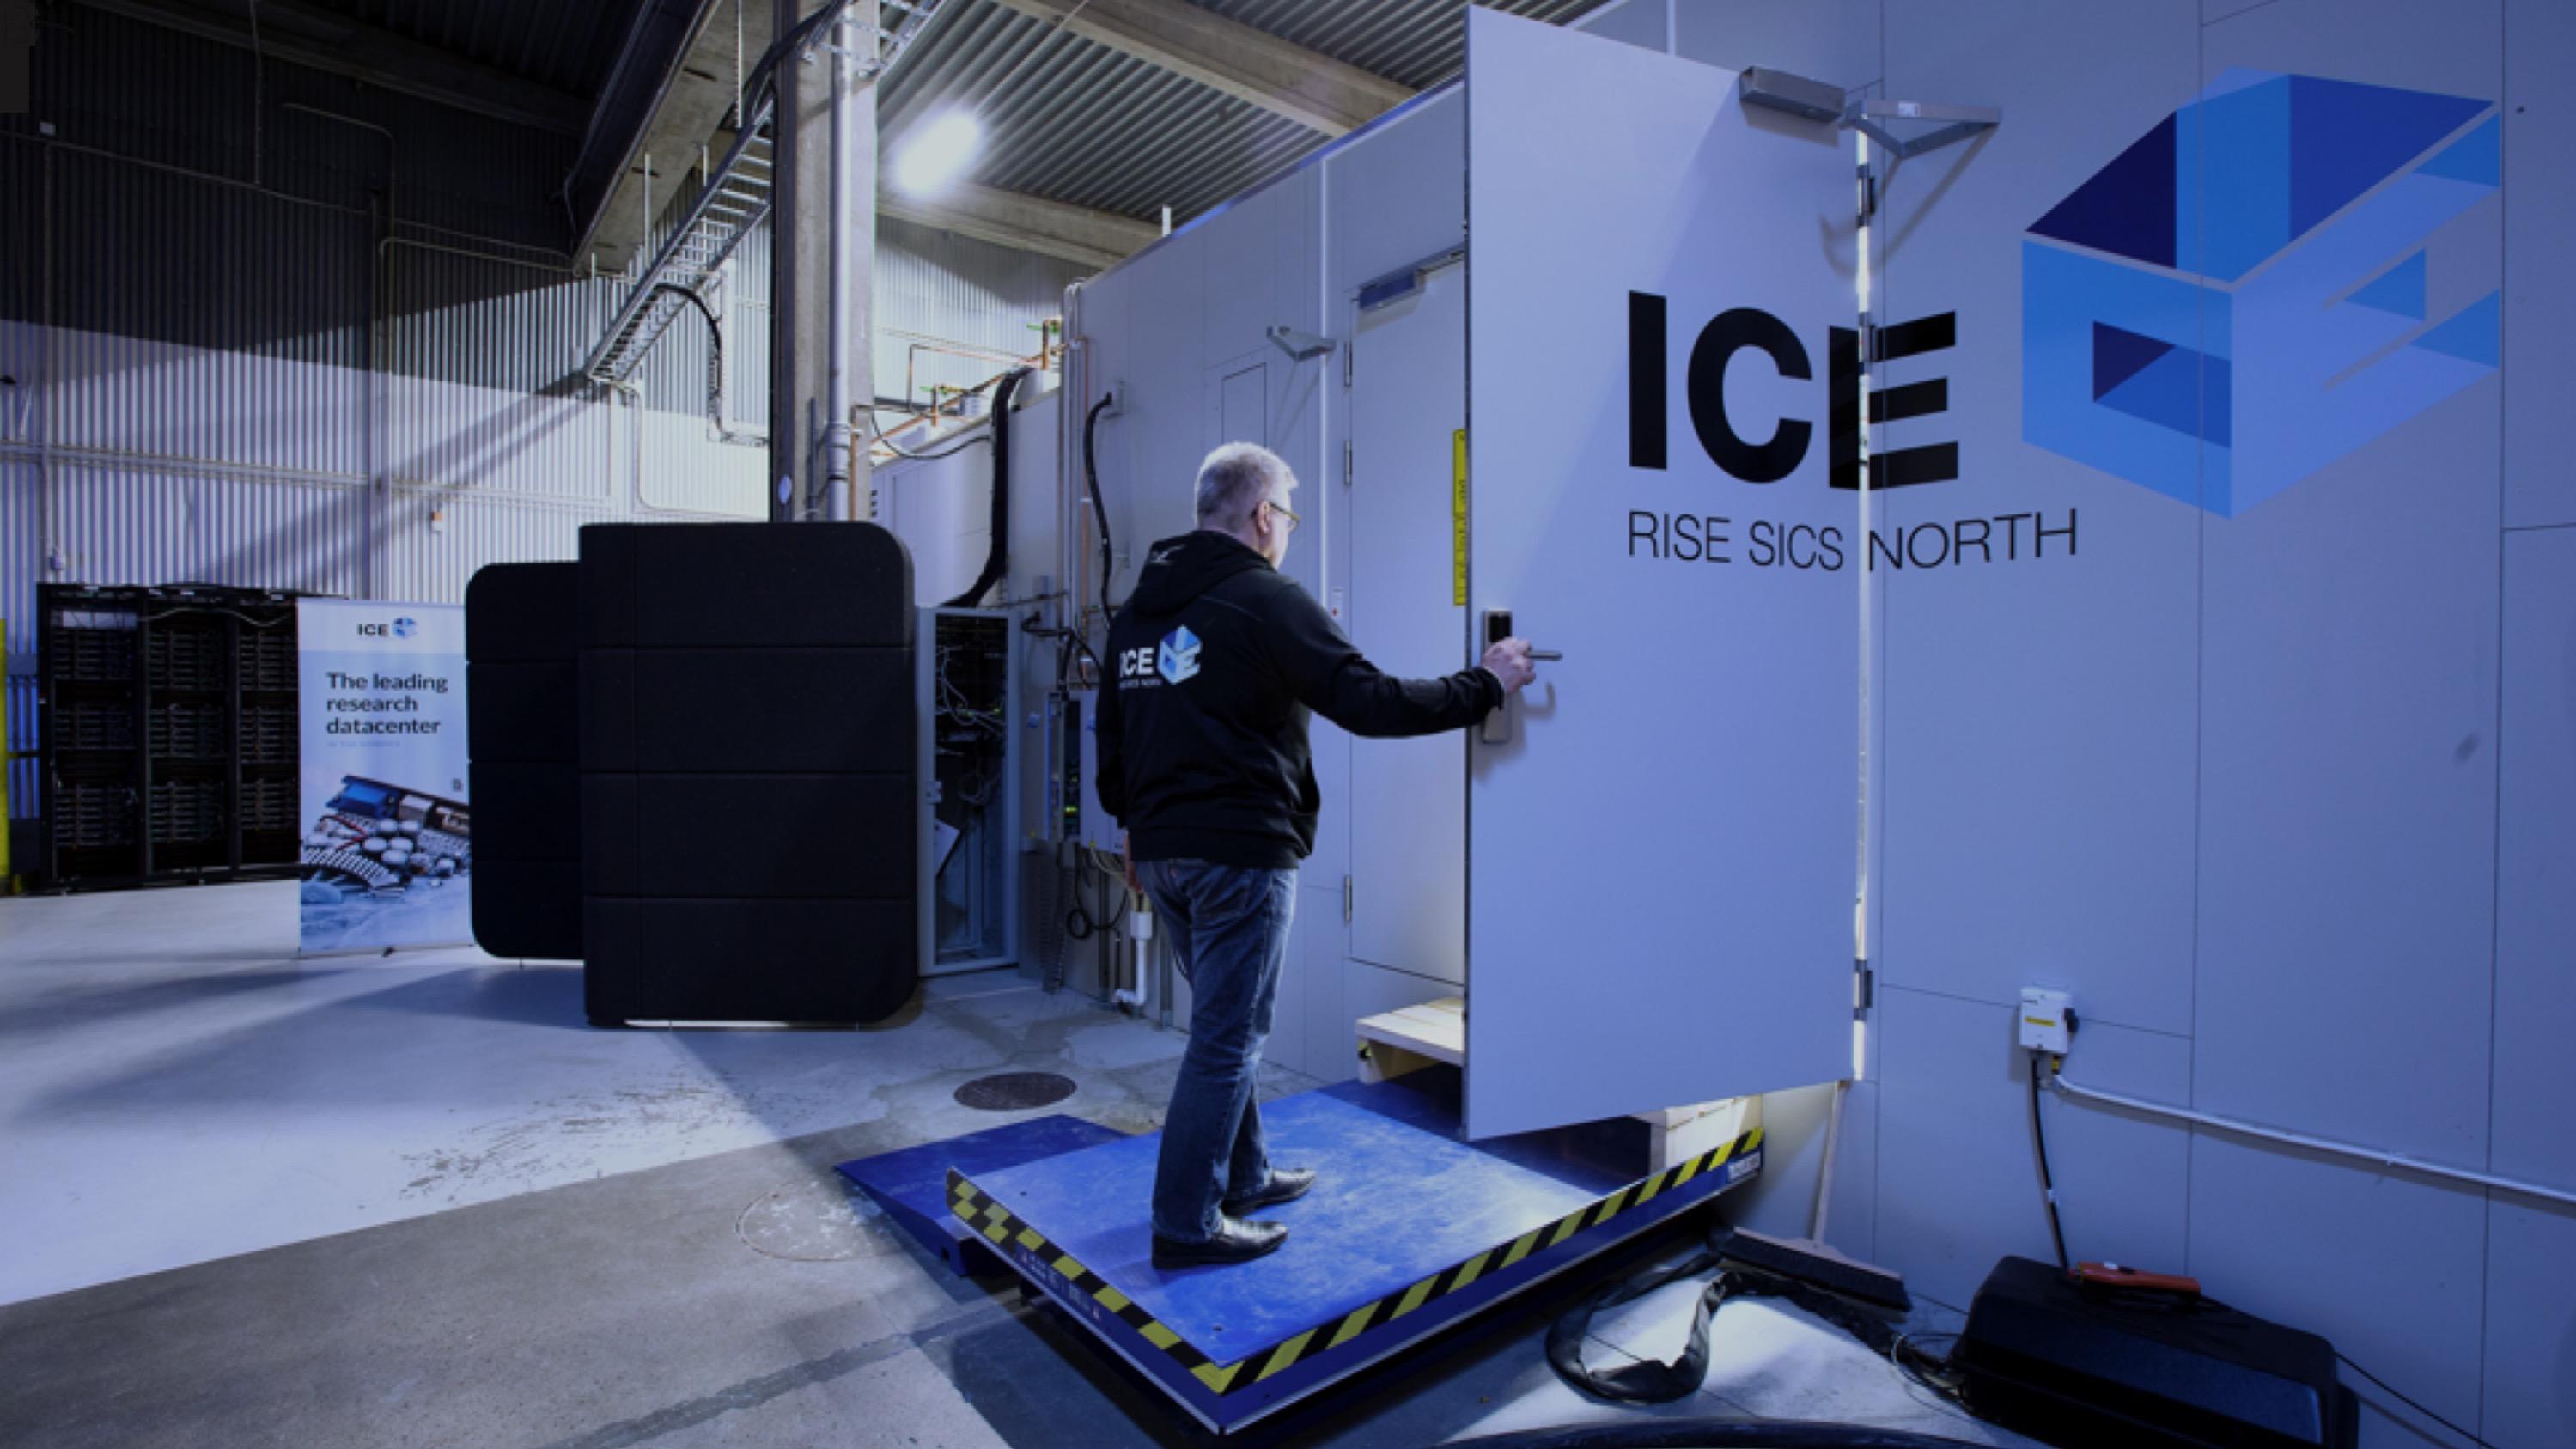 Öppet hus på SICS ICE!